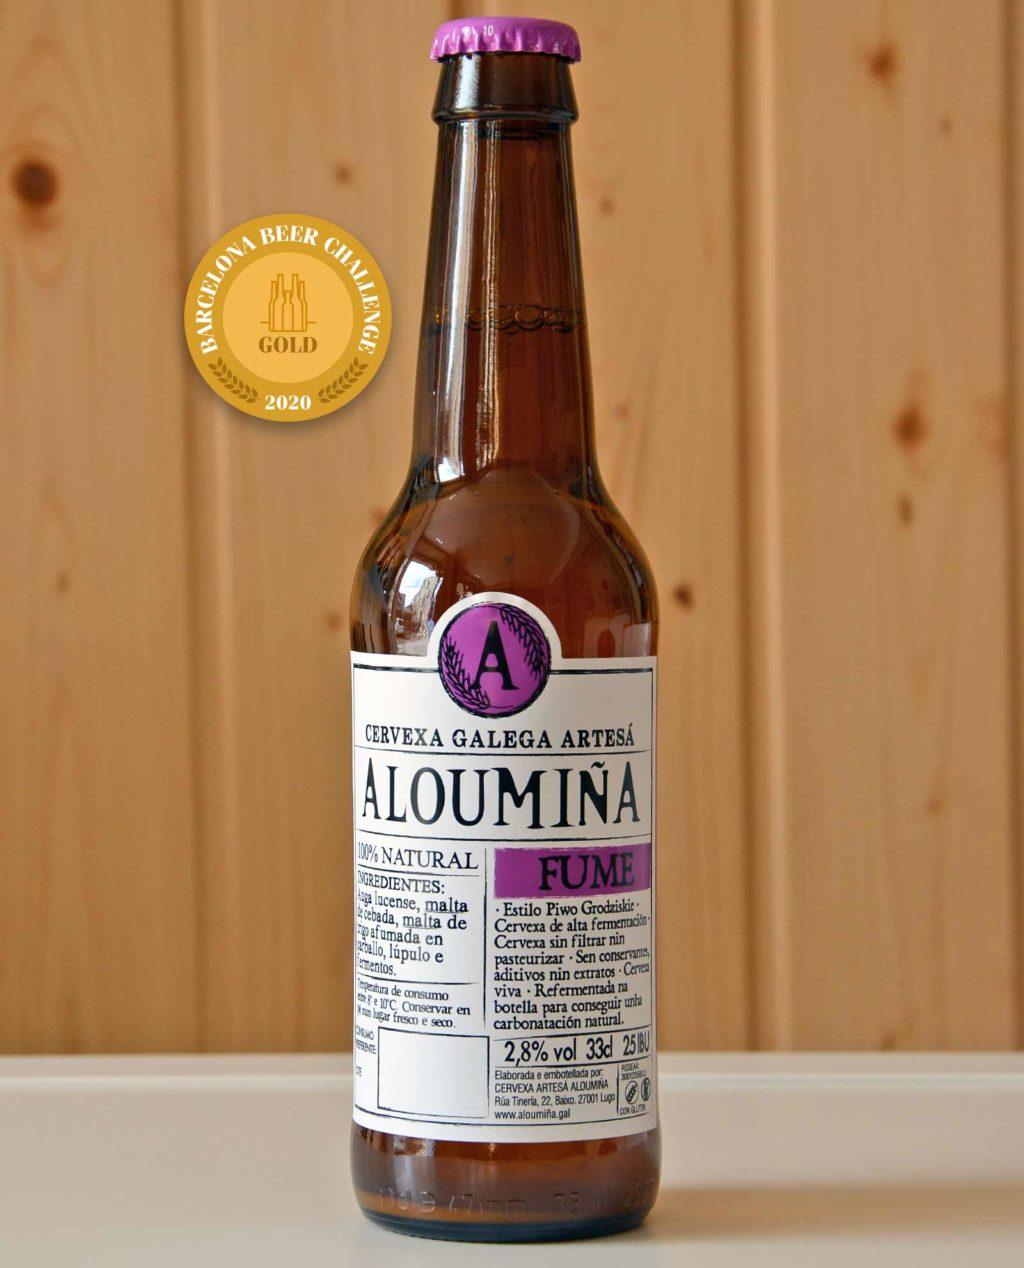 aloumina-cerveza-artesana-craft-beer-lugo-galicia-fume-piwo-grodziskie-bbc-historicalbeer-a